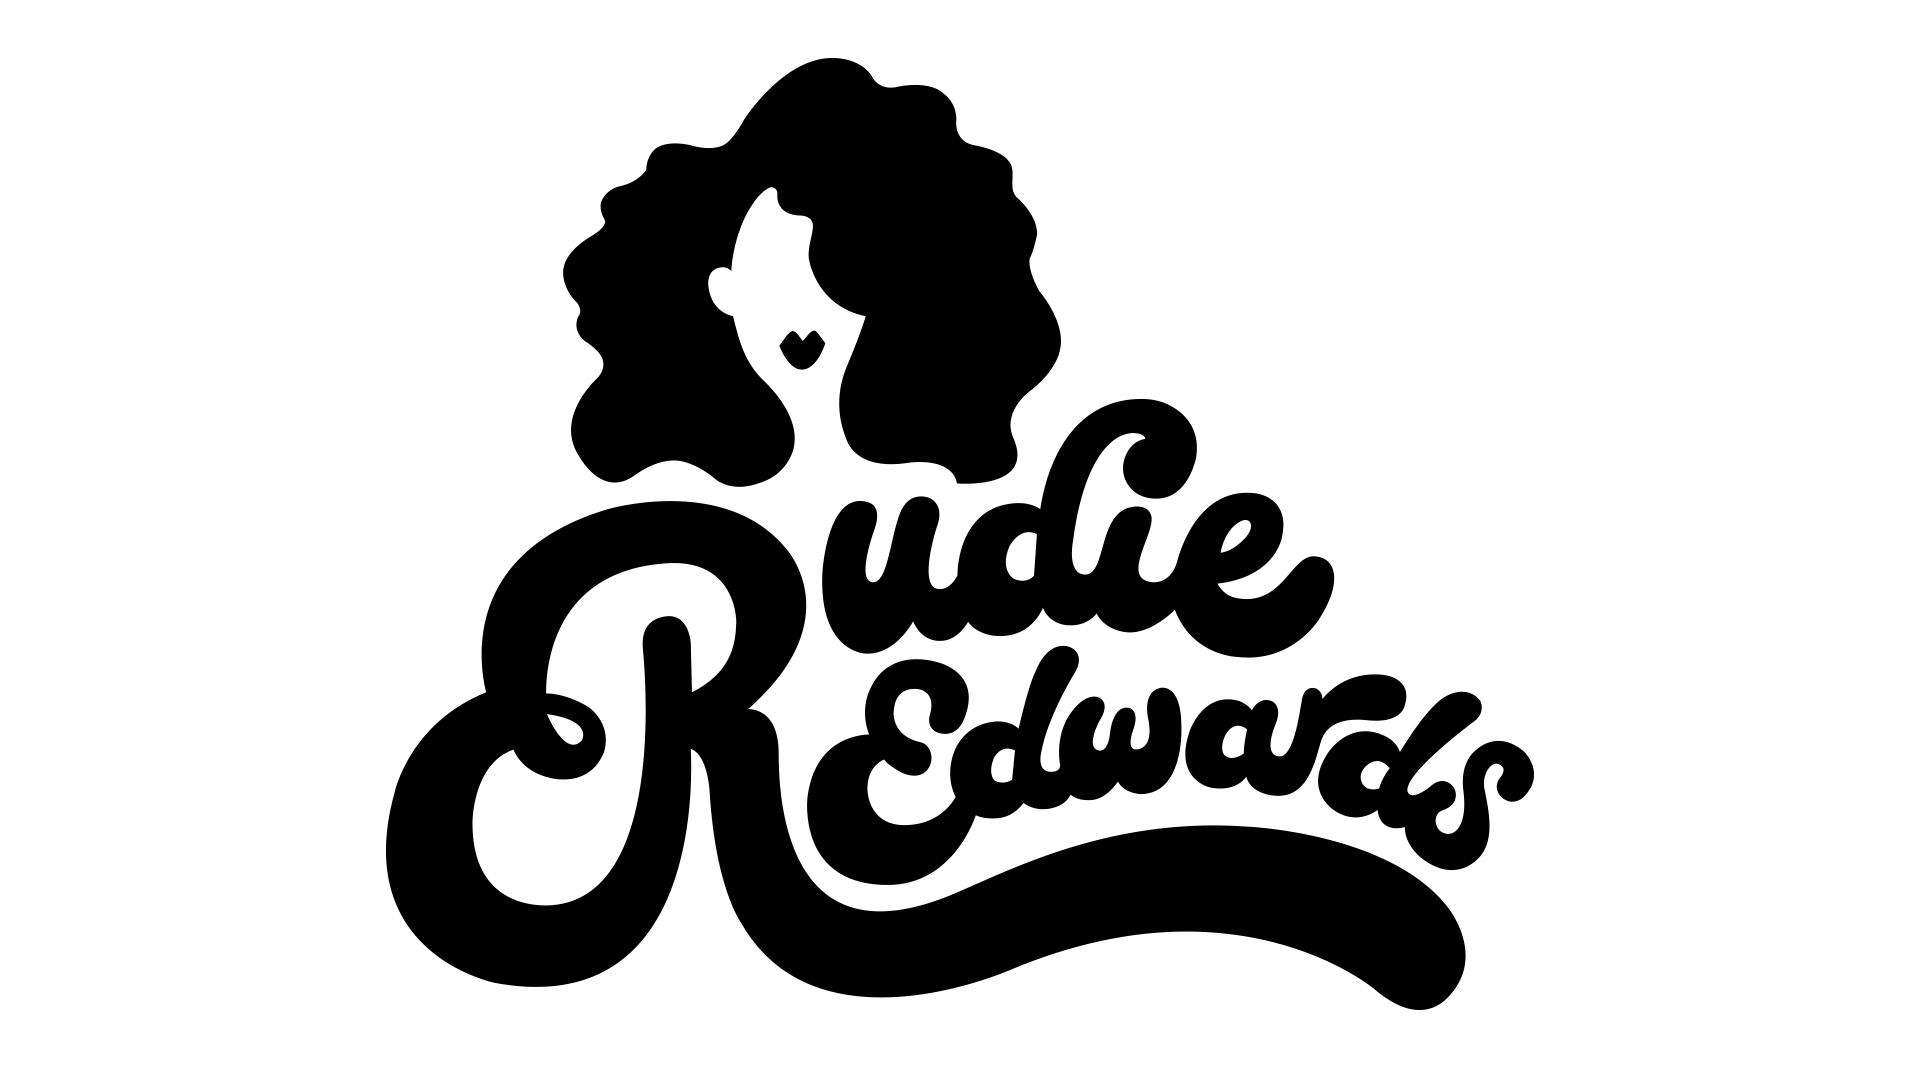 rudie-edwards-black-logo-on-white.jpg